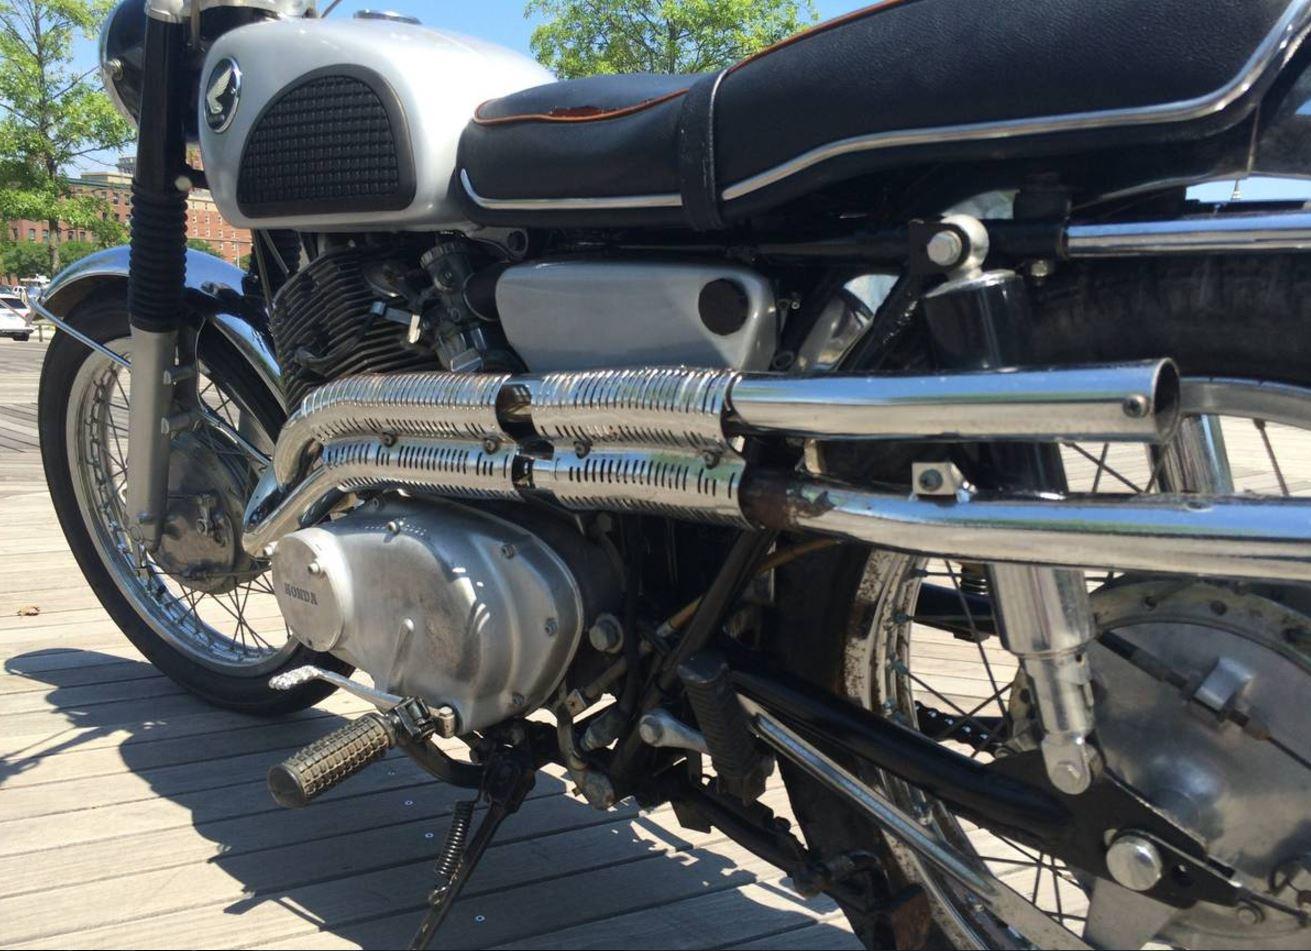 Craigslist Motorcycles Orange County California ...